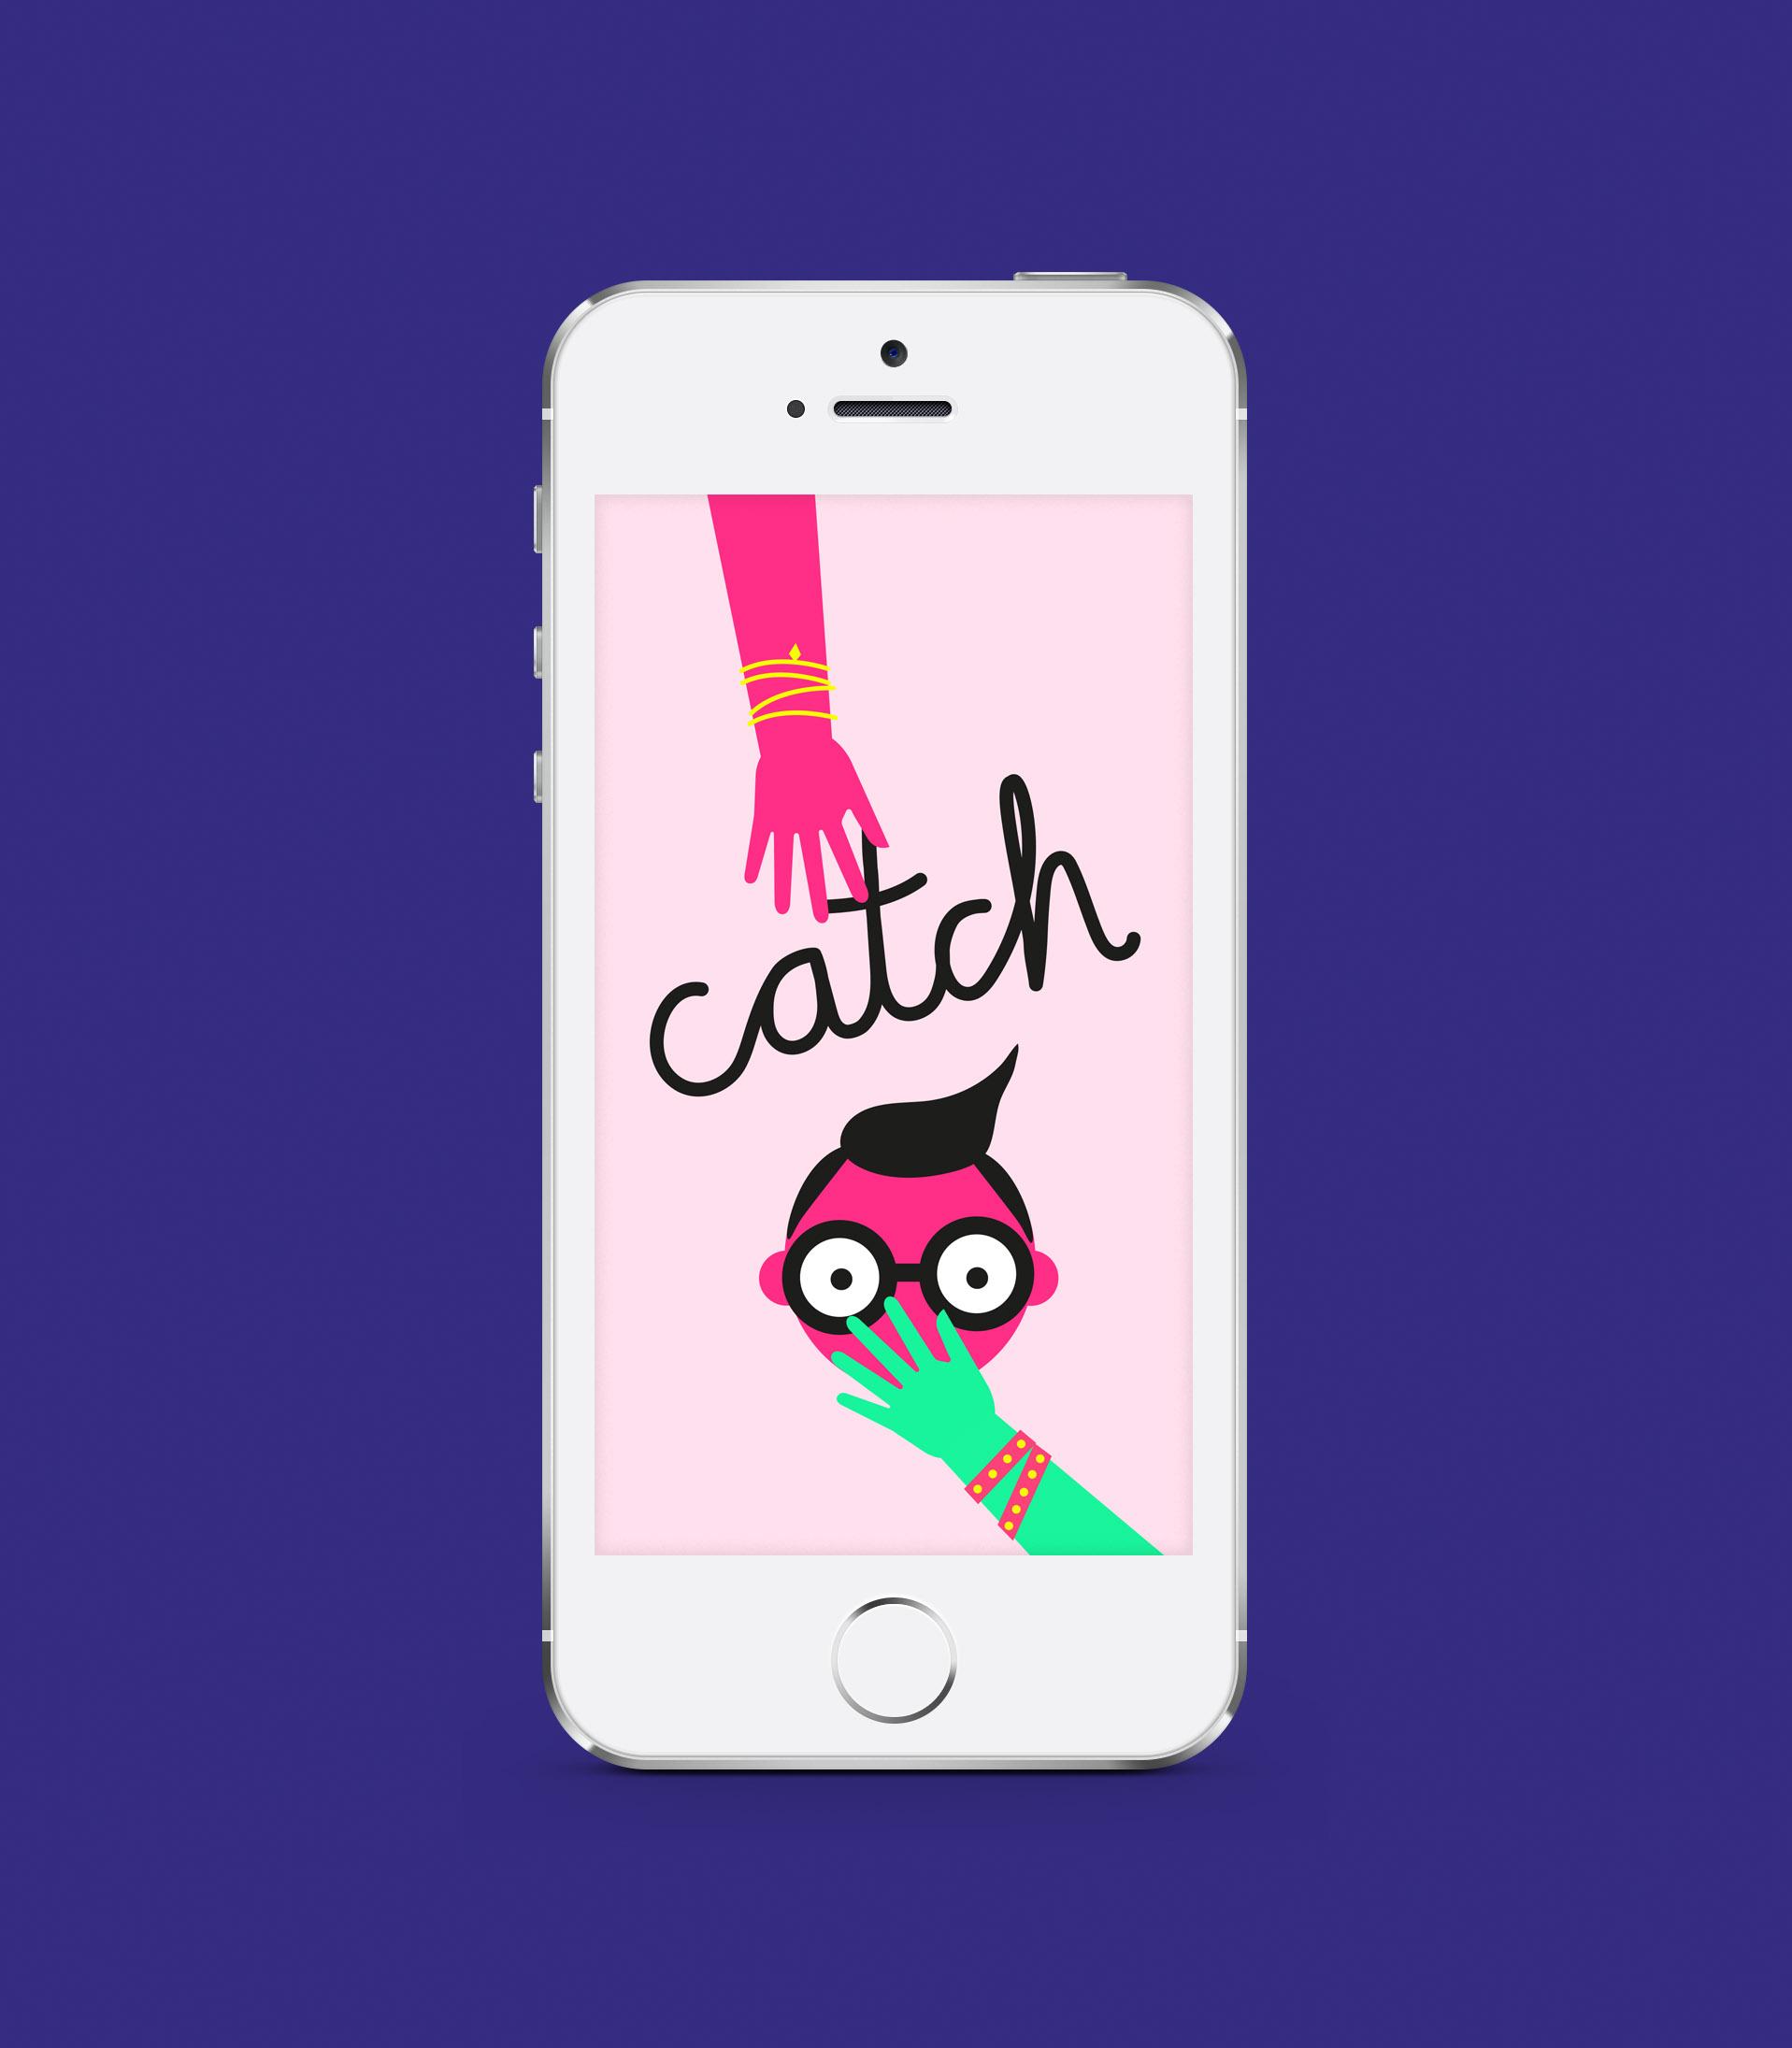 Catch mobile single